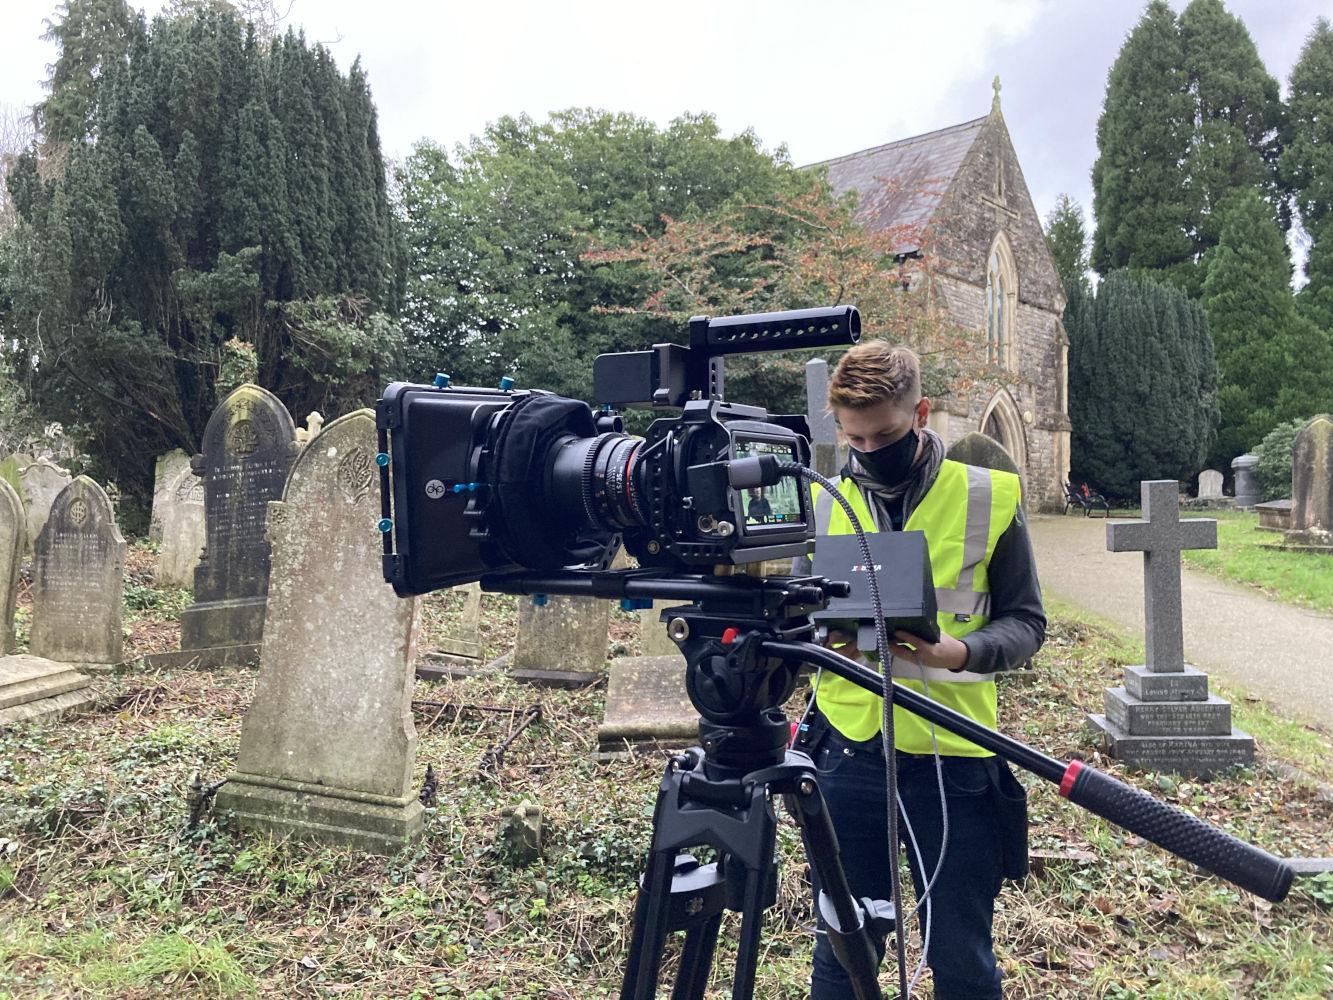 Behind the scenes image from Liam Calvert's Voyager short film of Blackmagic Pocket Cinema Camera 4K